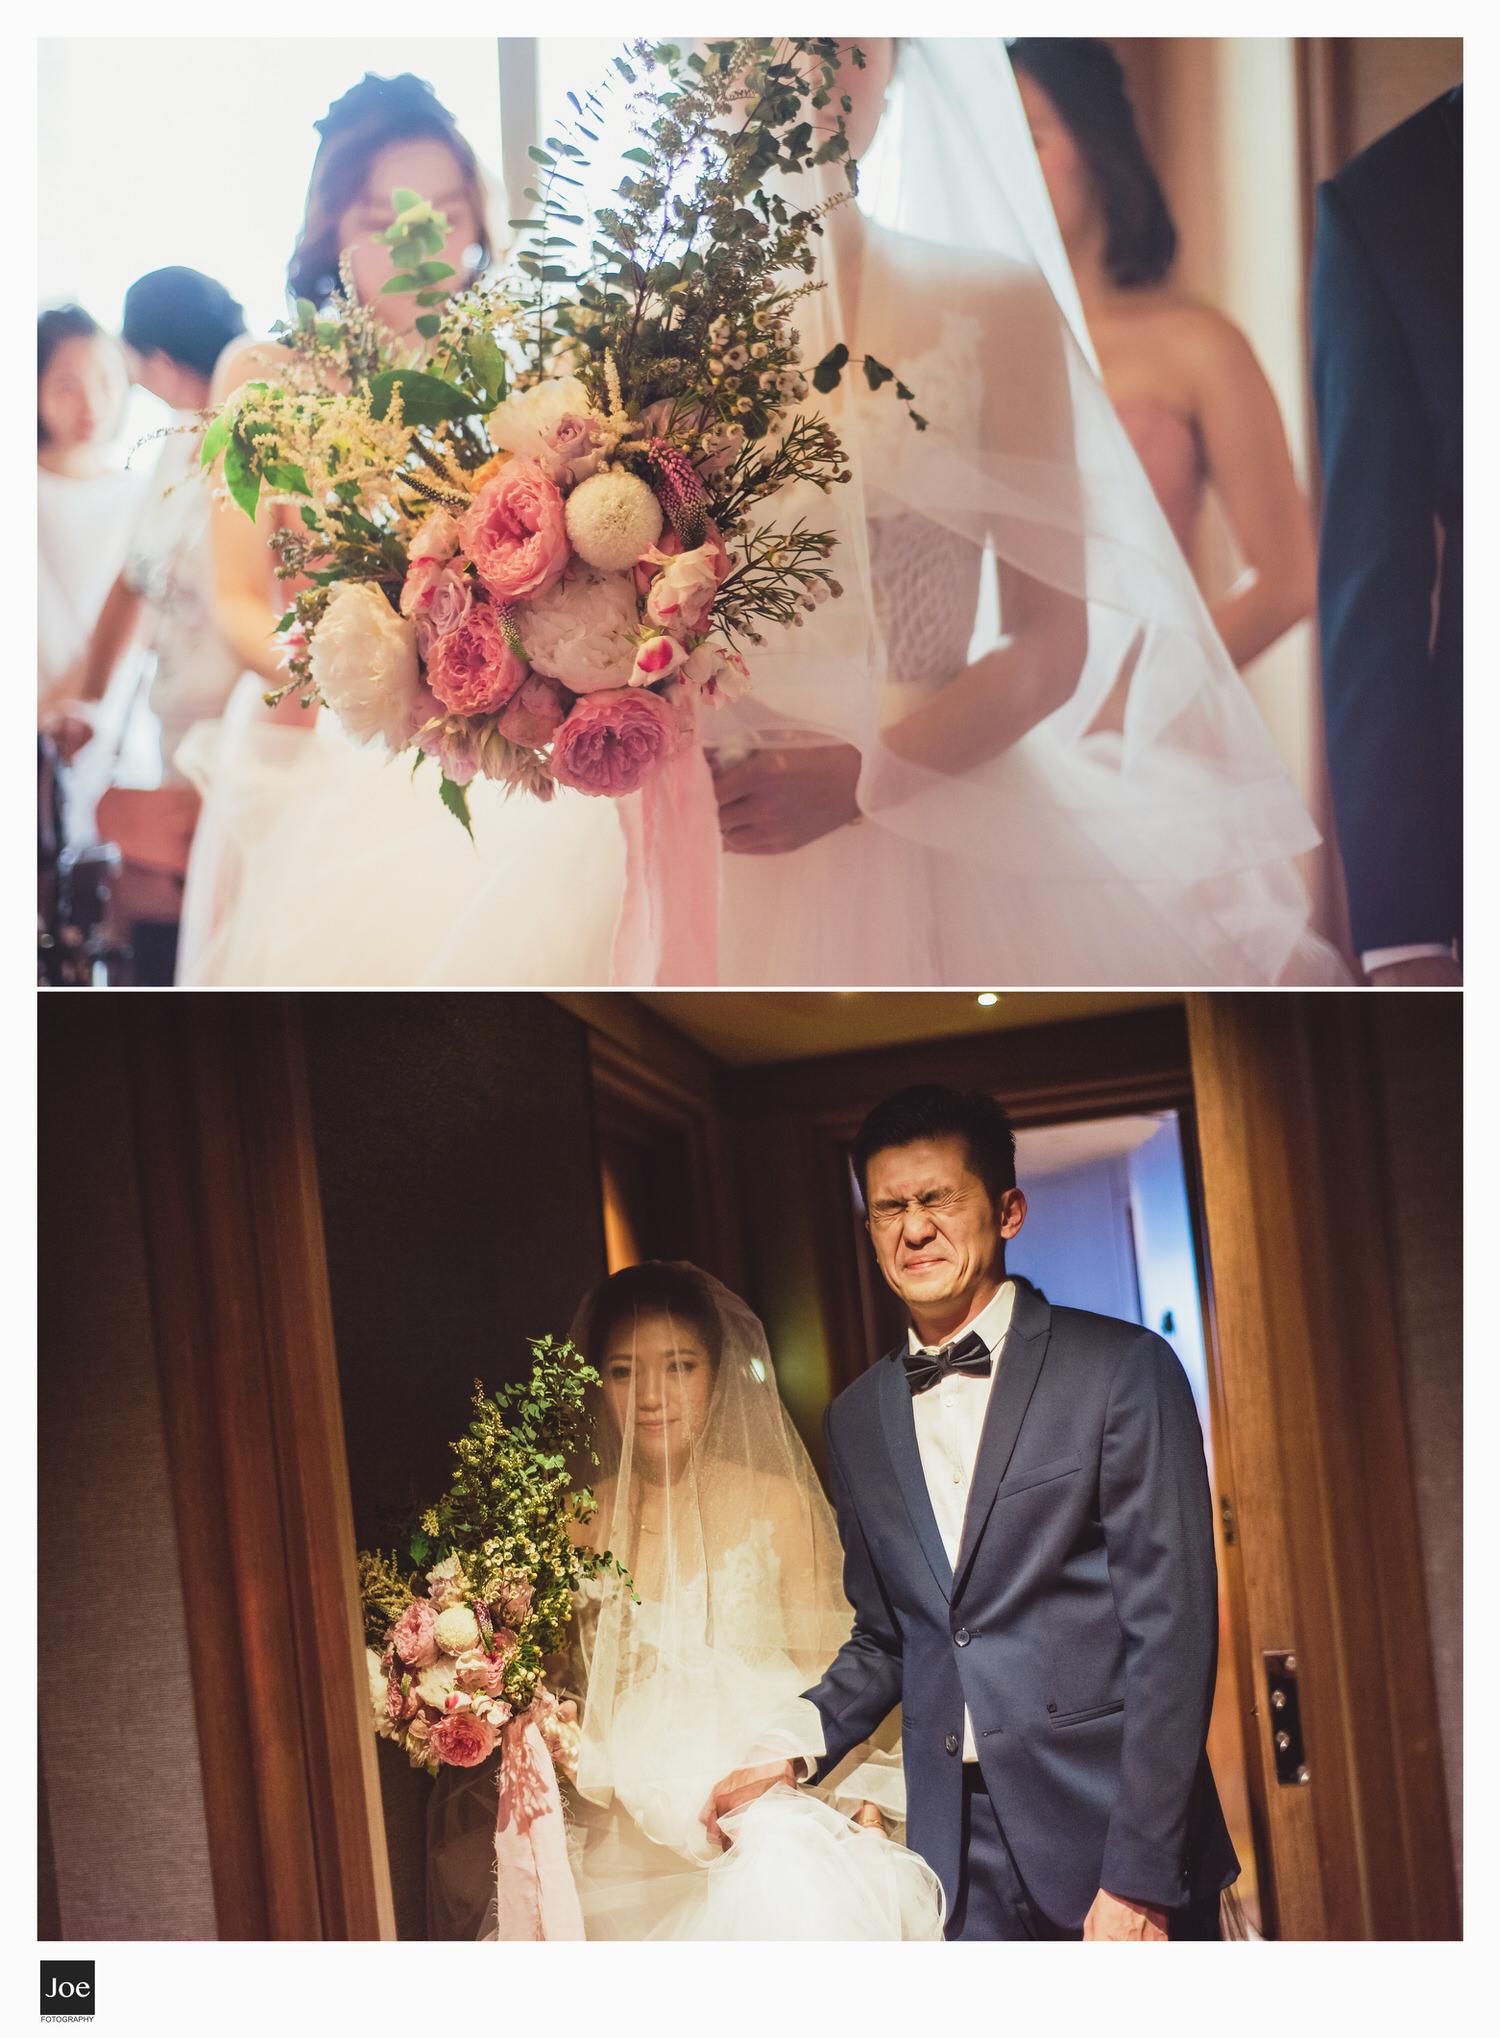 wedding-photography-shangri-la-far-eastern-plaza-hotel-ariel-sam-joe-fotography-078.jpg